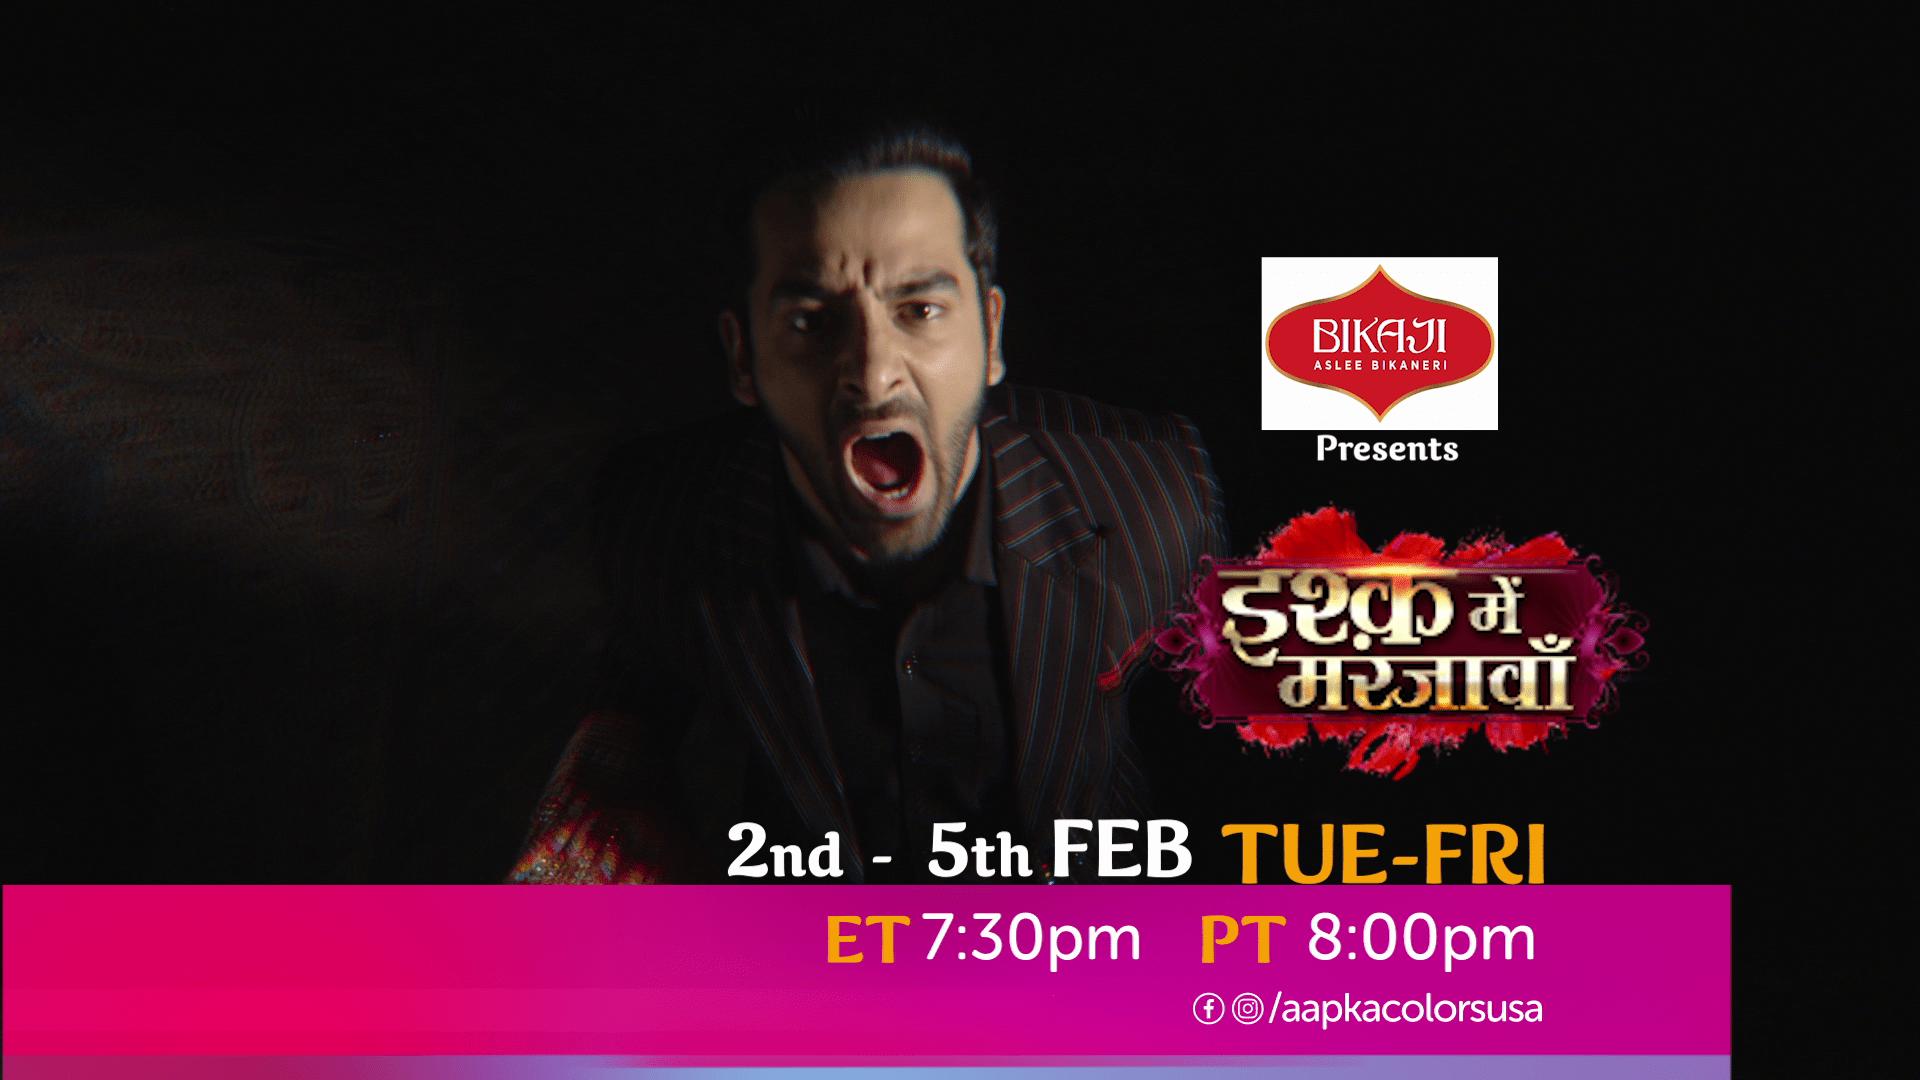 Watch Ishq Mein Marjawan 2nd-5th Feb Tue-Fri at  ET 7:30pm  PT 8:00pm on Aapkacolors